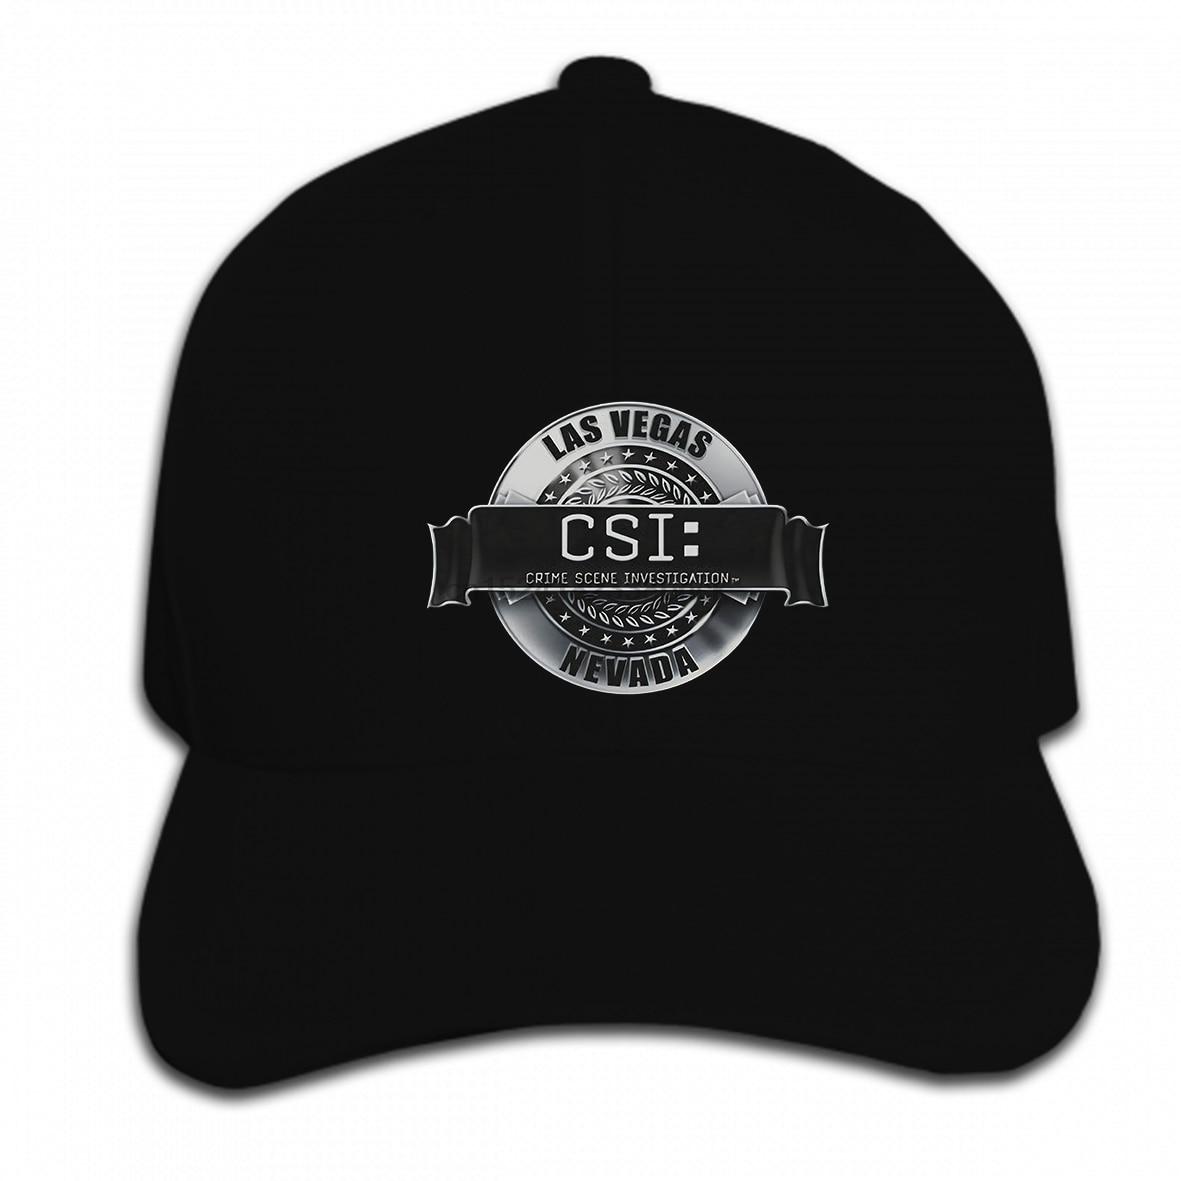 Imprimir gorra de béisbol personalizada Hip Hop CSI TV Show Las Vegas Nevada renderizado logotipo autorizado sombrero gorra pico